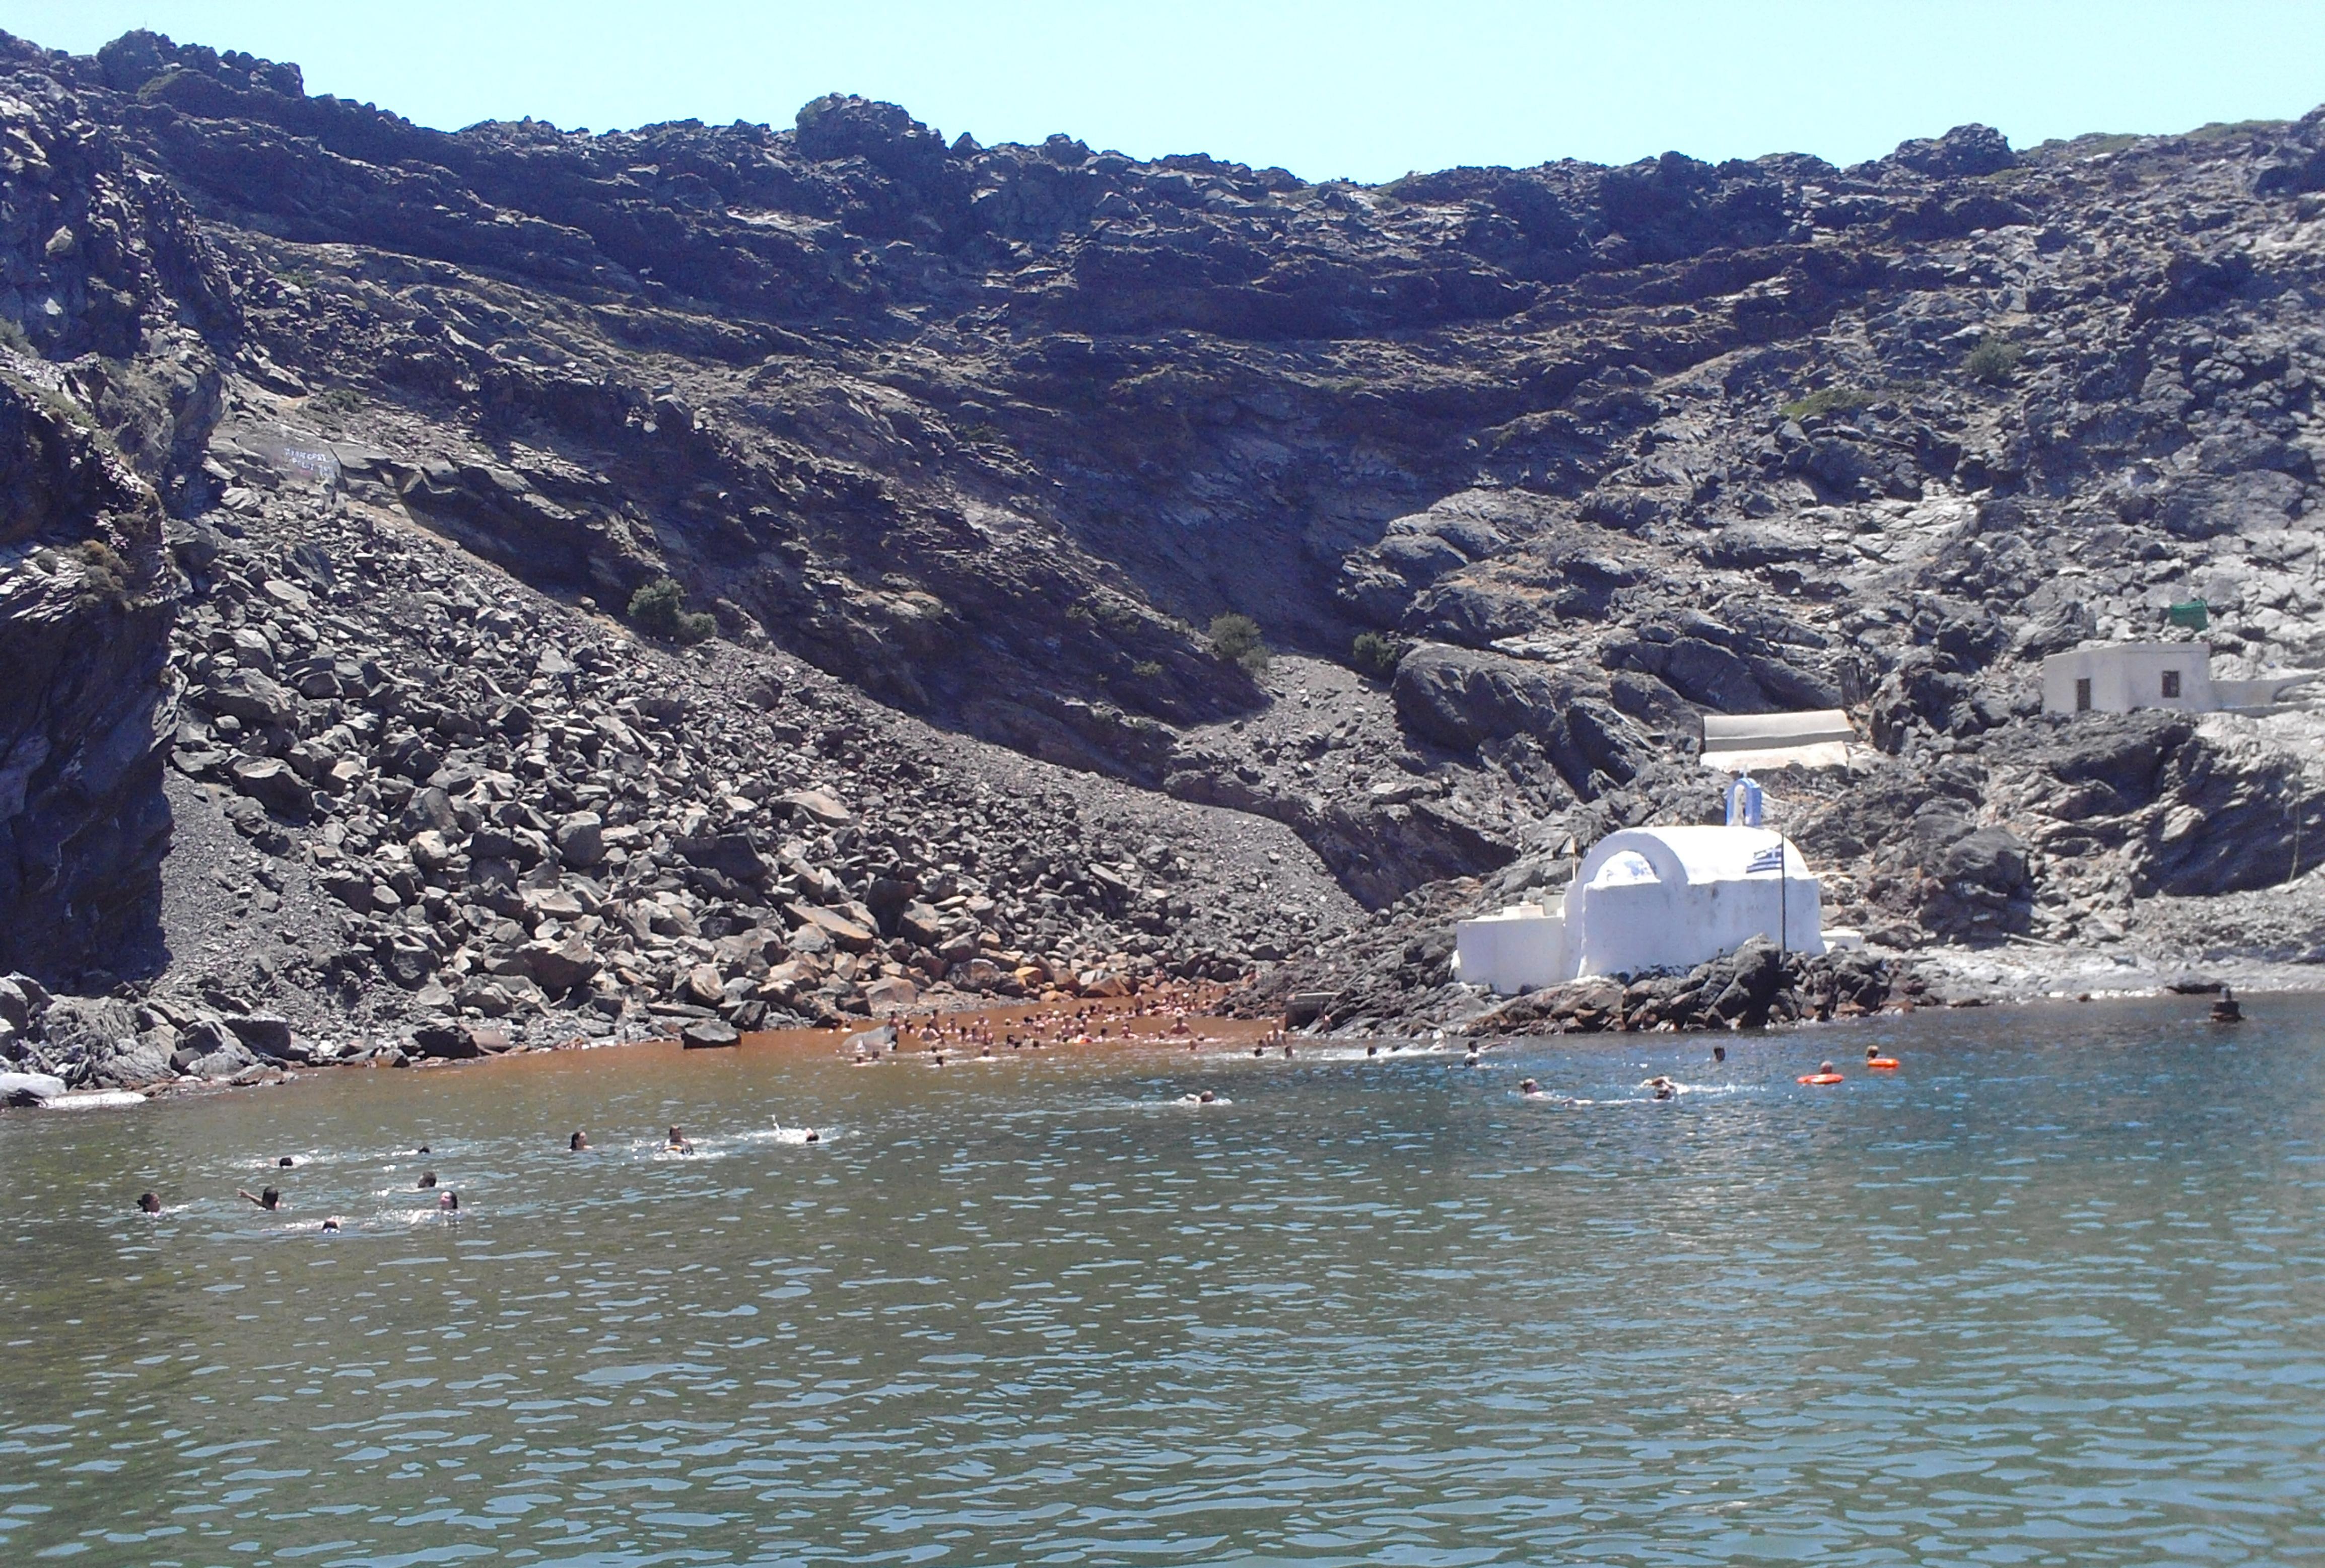 11. Holy thermal spring - Palea Kameni islet (η Παλαιά Καμένη), Santorini